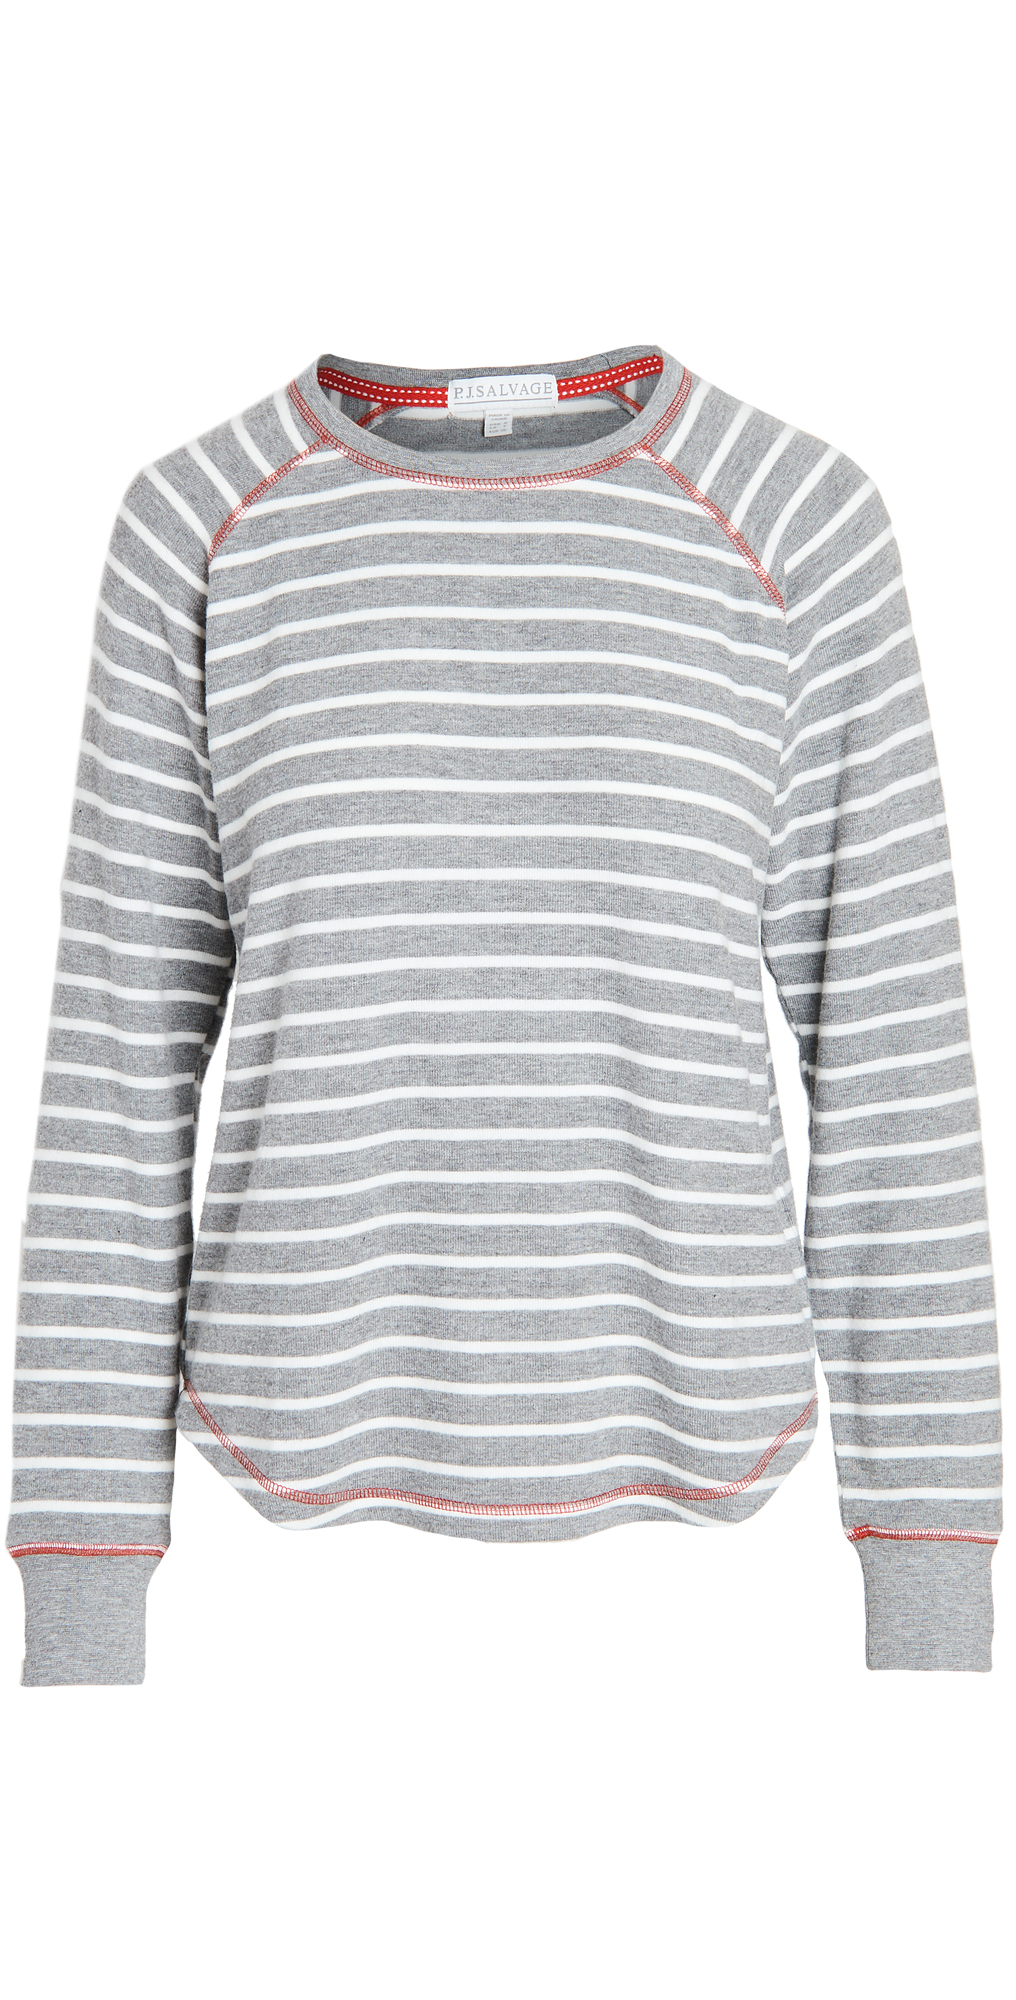 PJ Salvage Joyful Long Sleeve Top